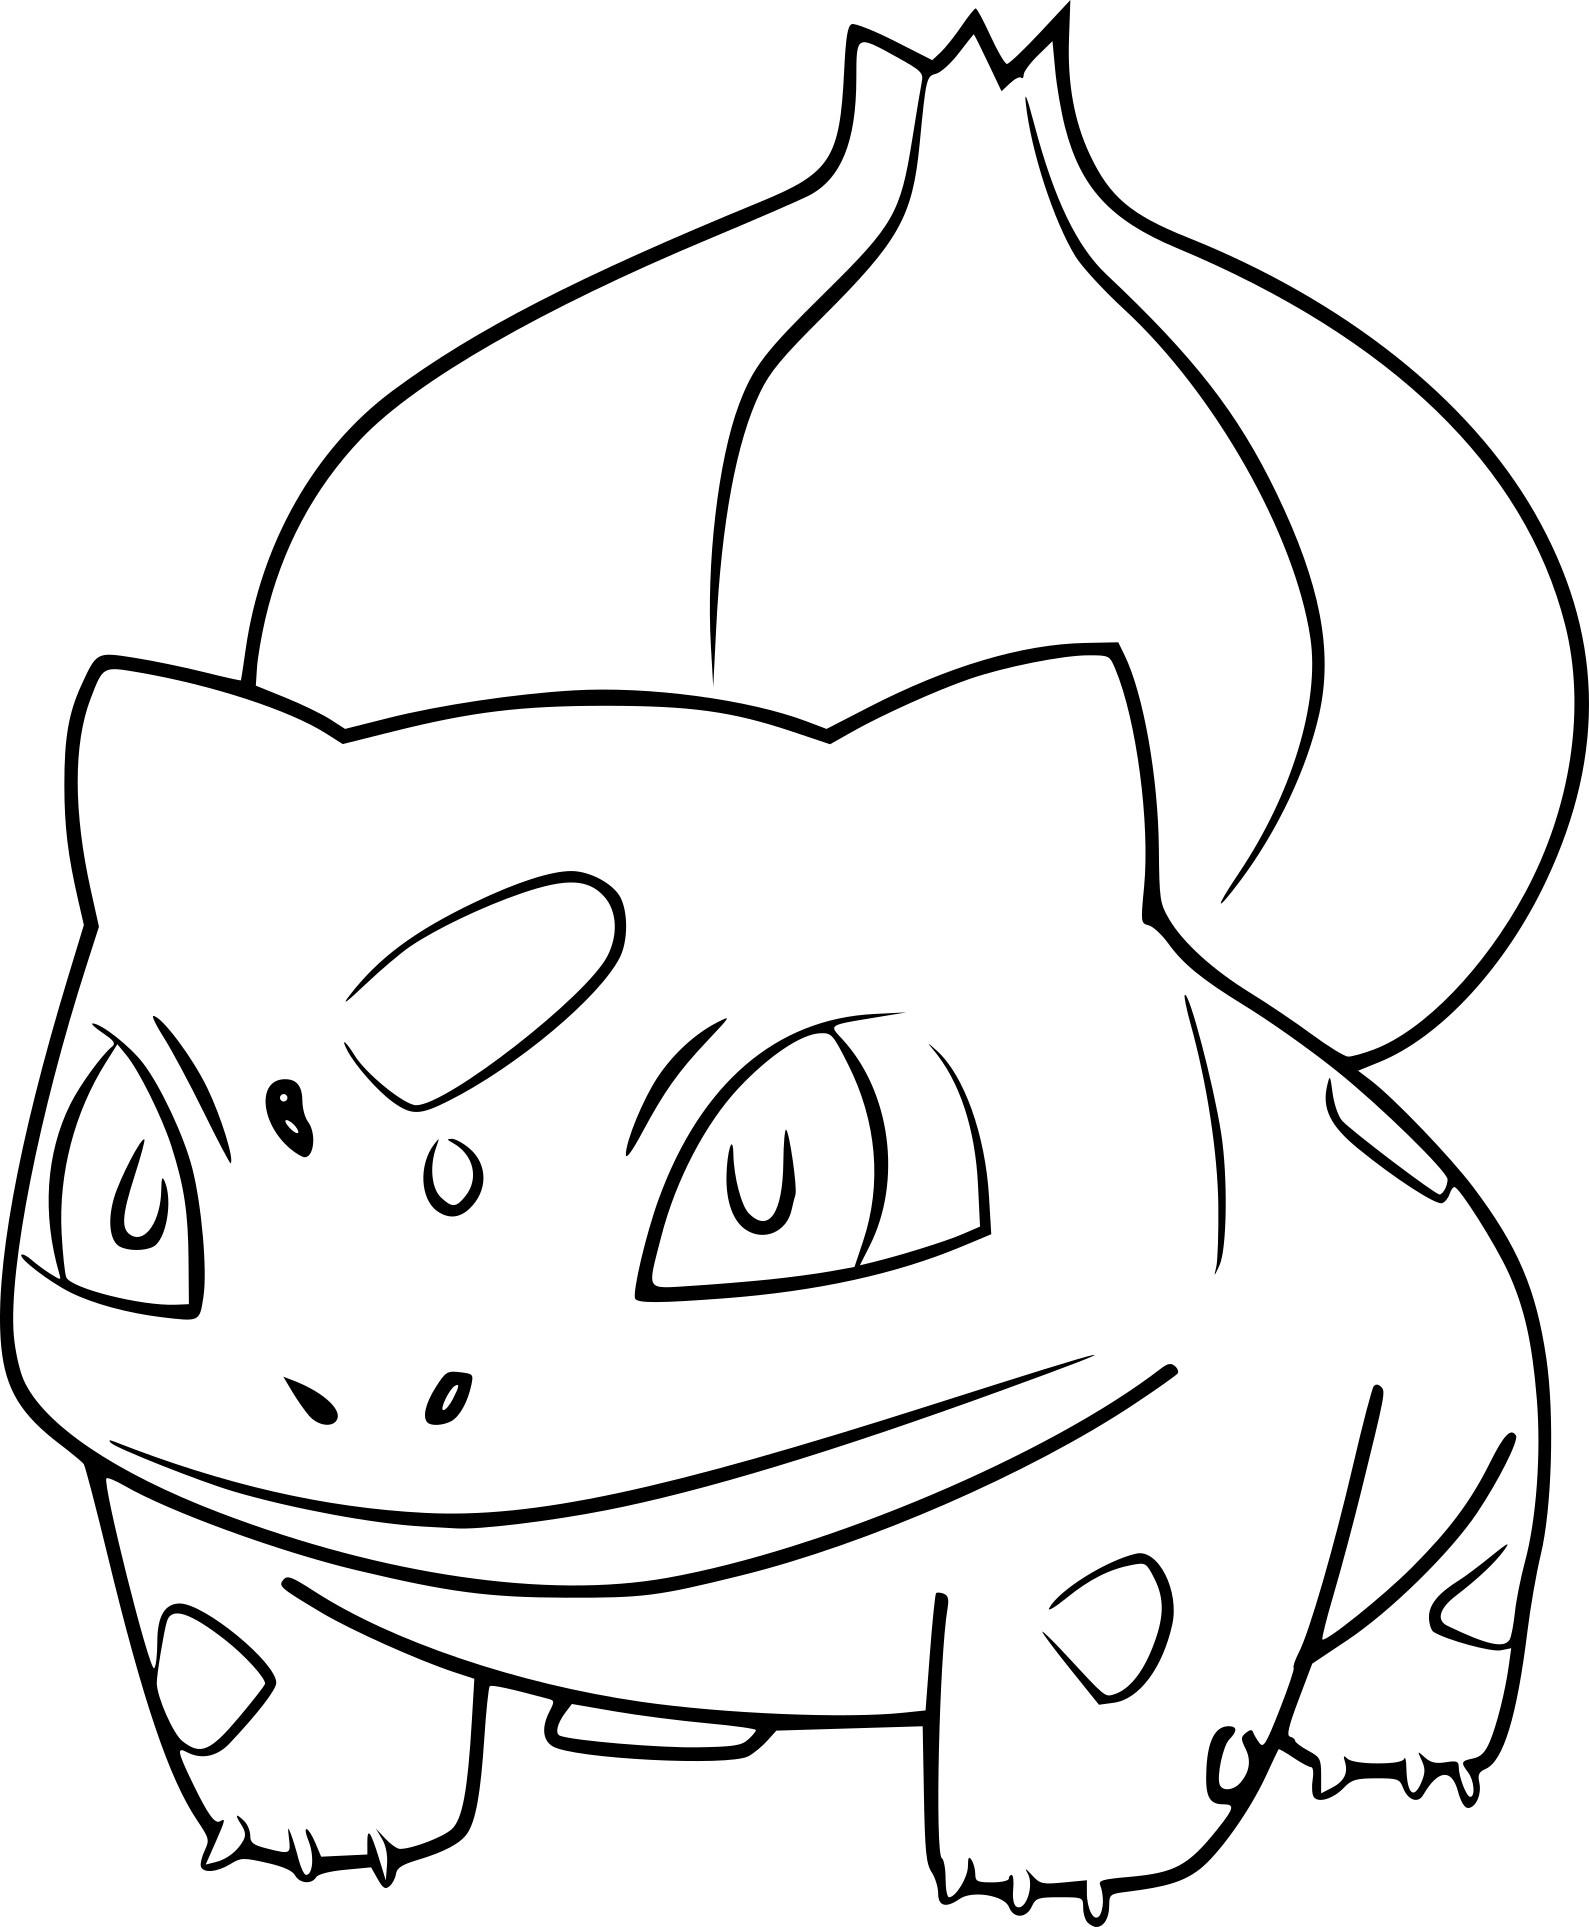 Coloriage Bulbizarre Pokemon Go À Imprimer Sur Coloriages avec Coloriage Pokemon Salameche Imprimer